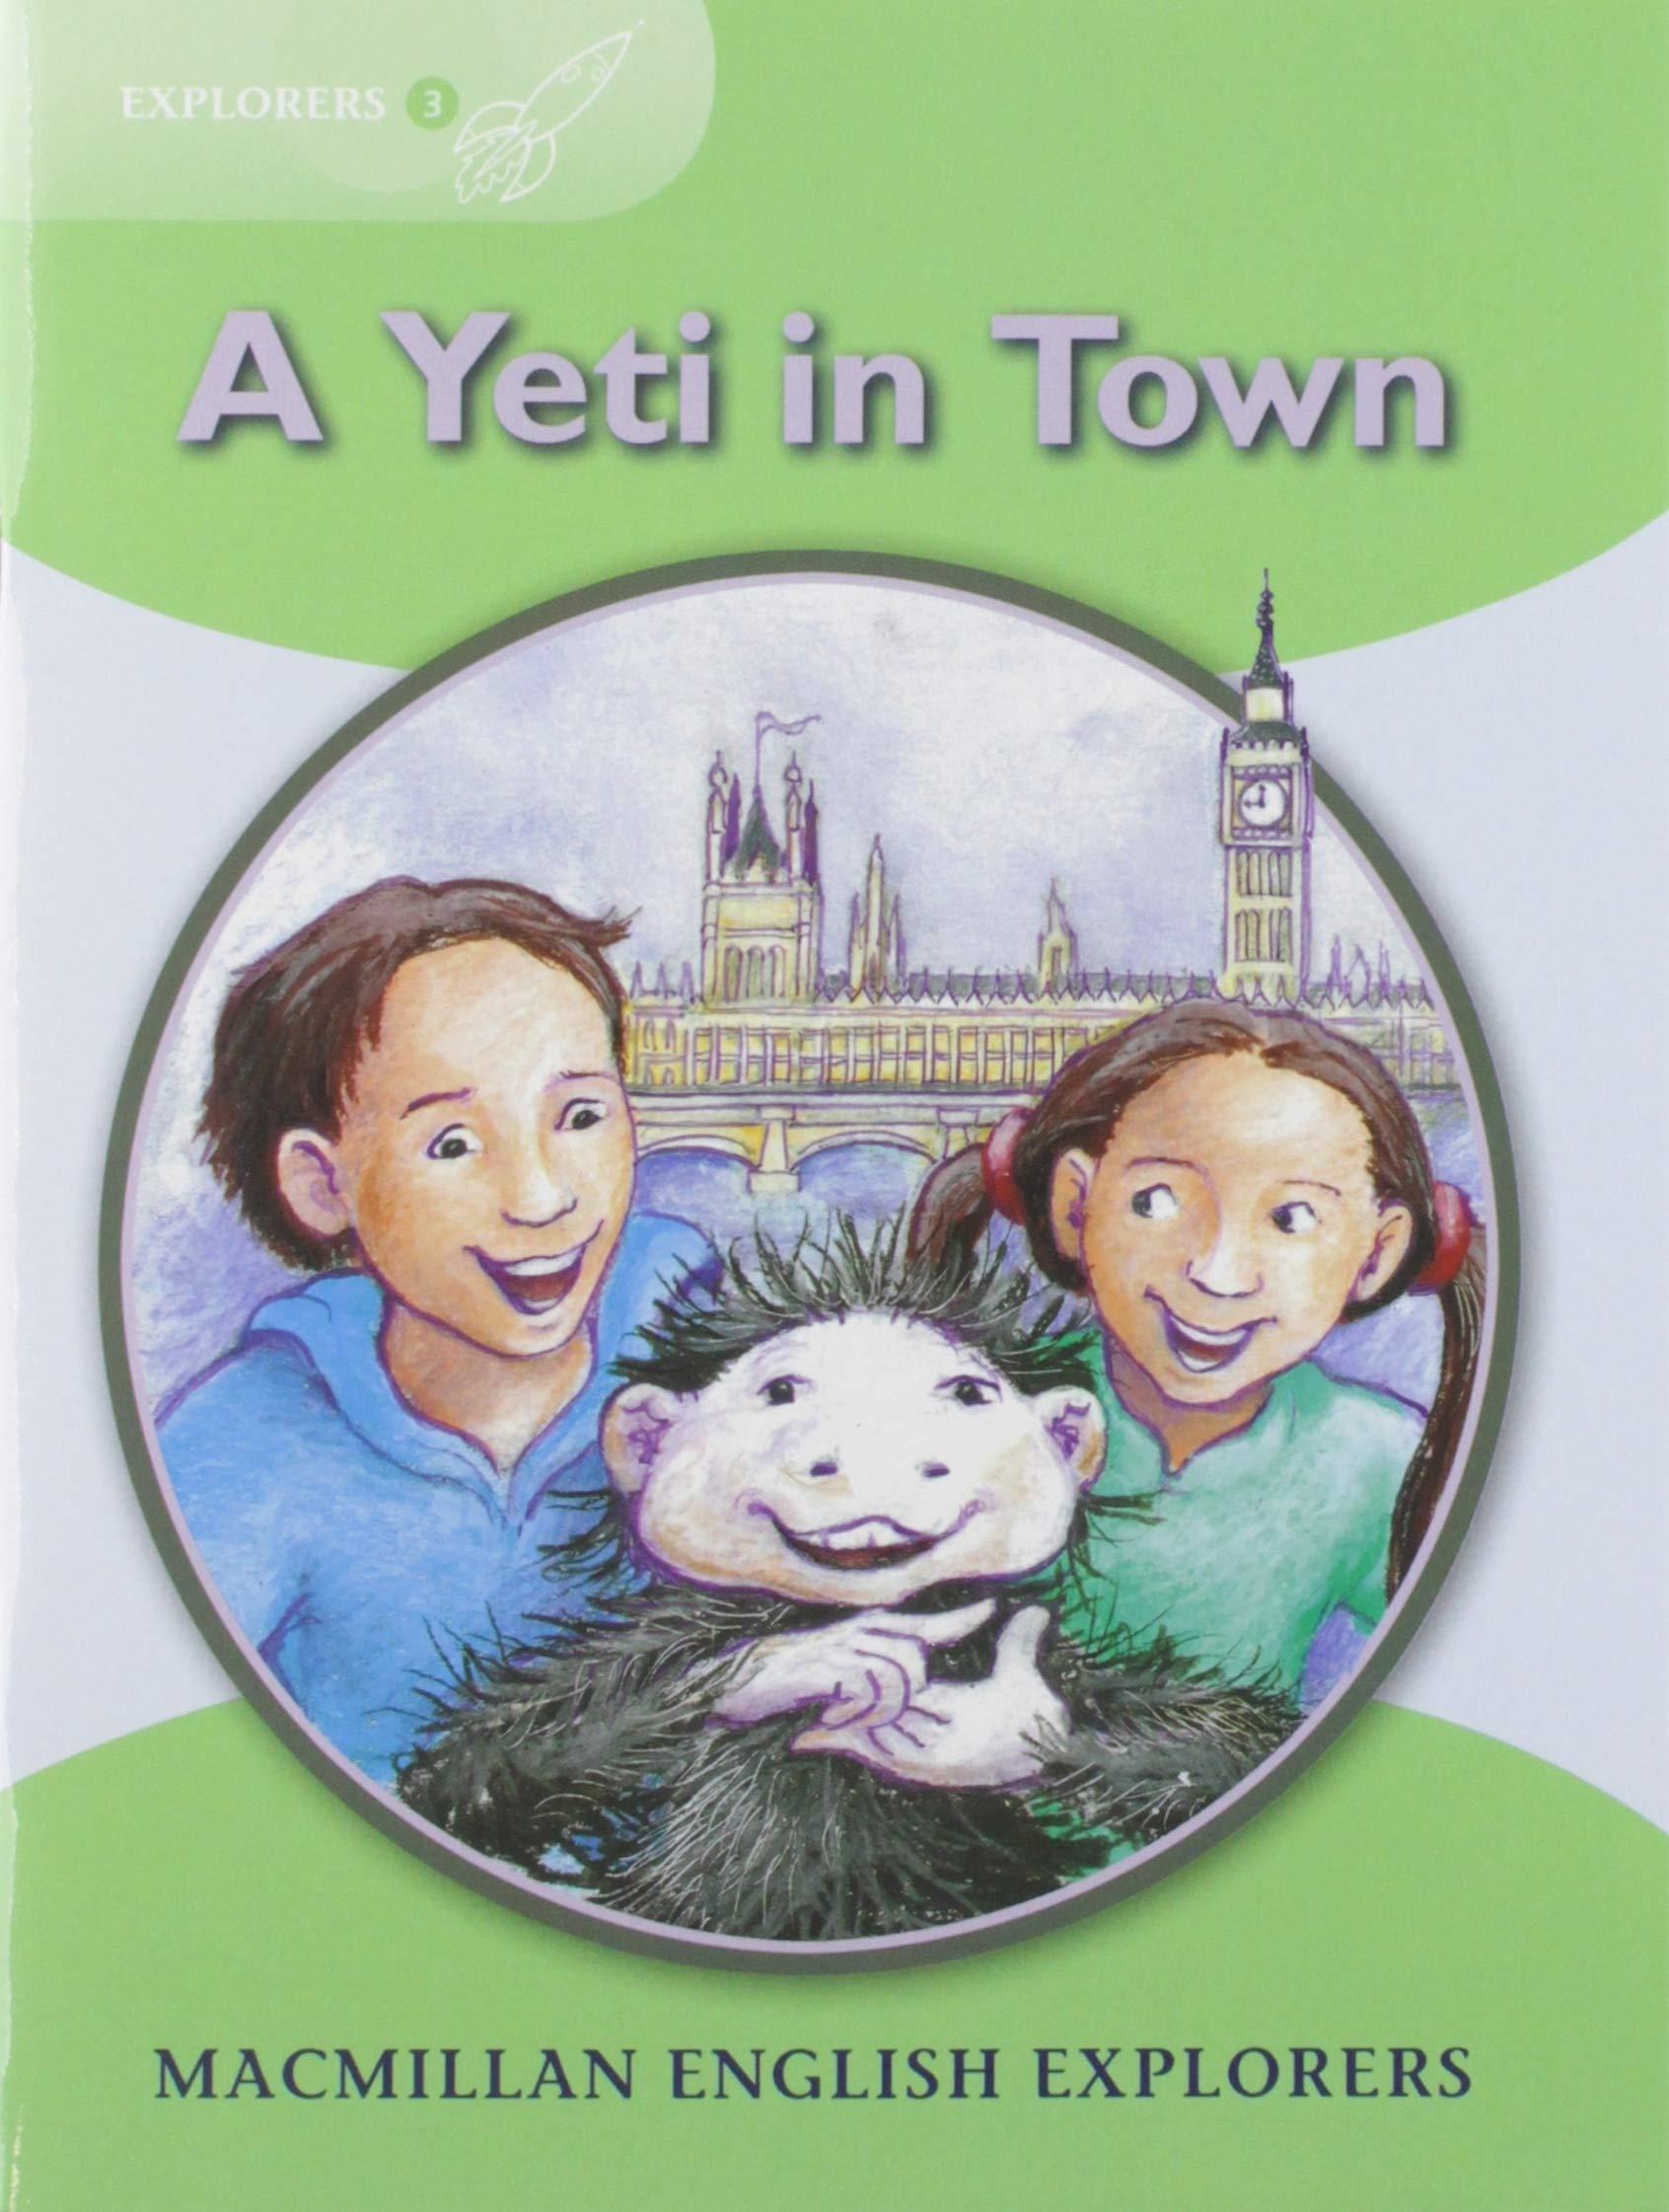 Explorers 3 Yeti Comes to Town New Ed MAC Eng Expl Readers: Amazon.es: Brown, Richard: Libros en idiomas extranjeros